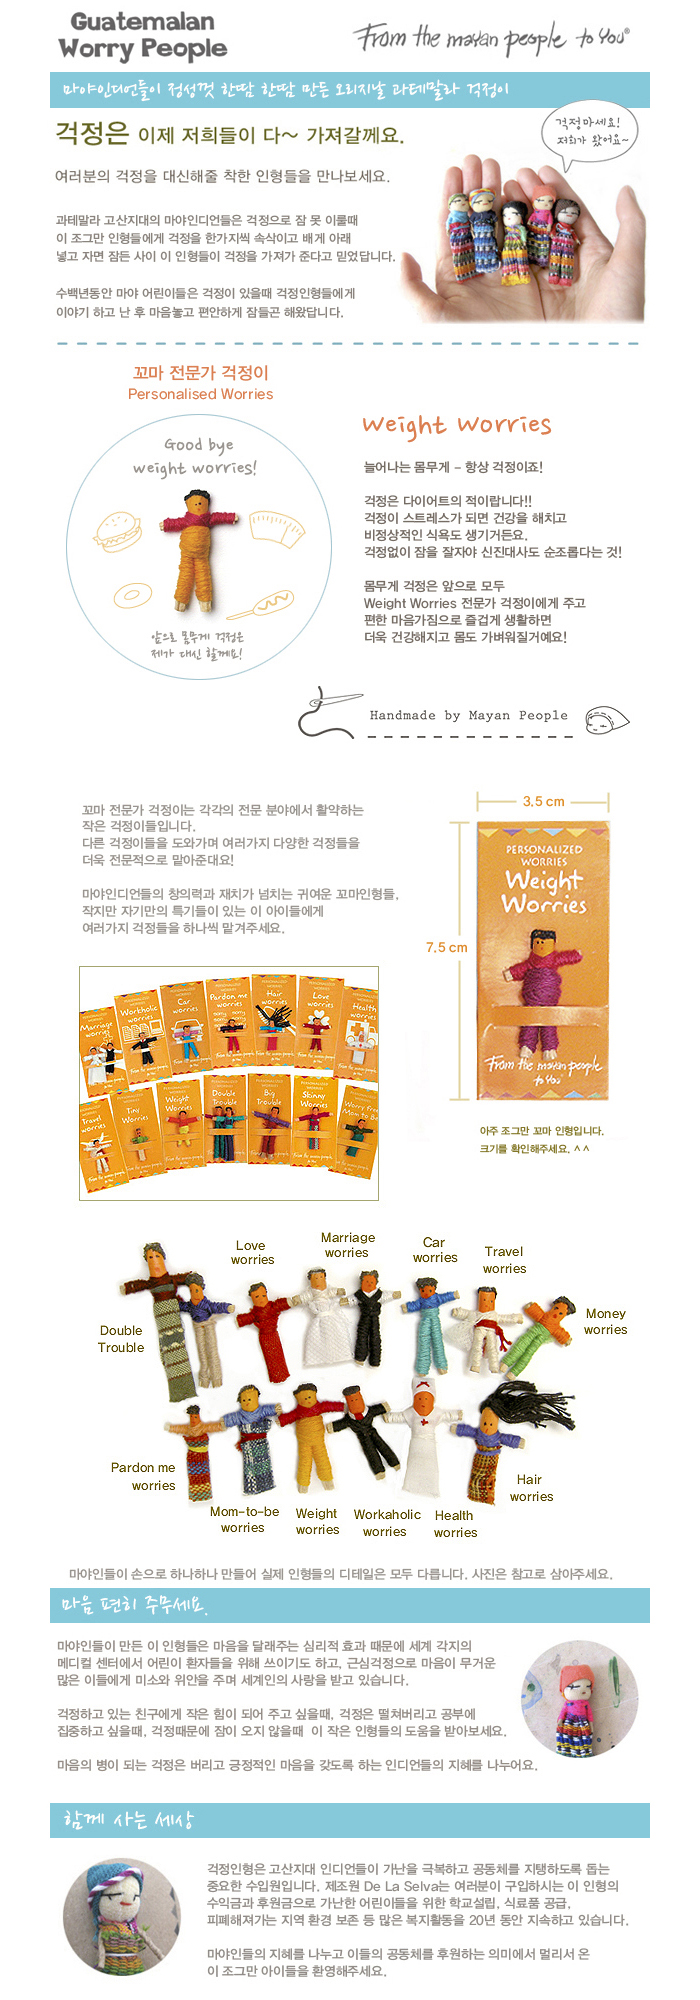 Weight Worries 꼬마 전문가 걱정인형 - 워리피플, 1,870원, 걱정인형, 워리피플